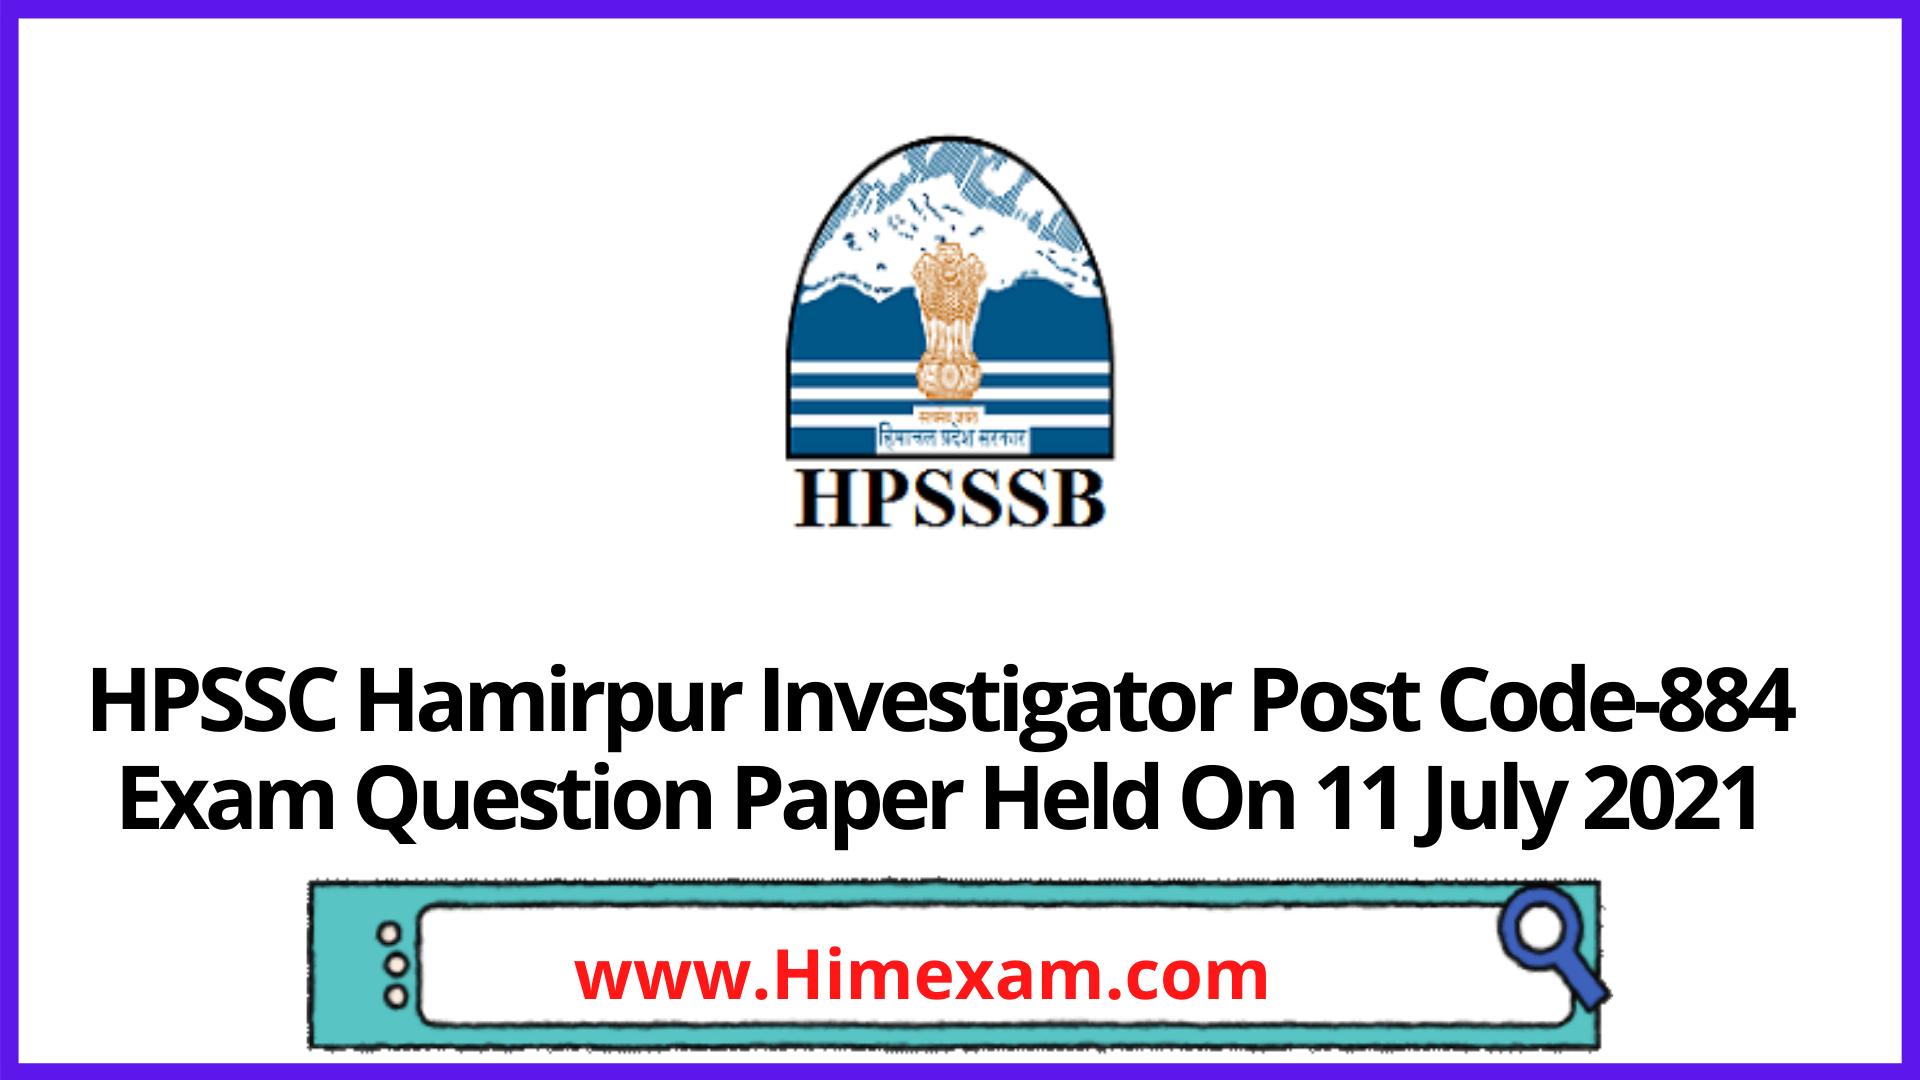 HPSSC Hamirpur Investigator Post Code-884 Exam Question Paper Held On 11 July 2021